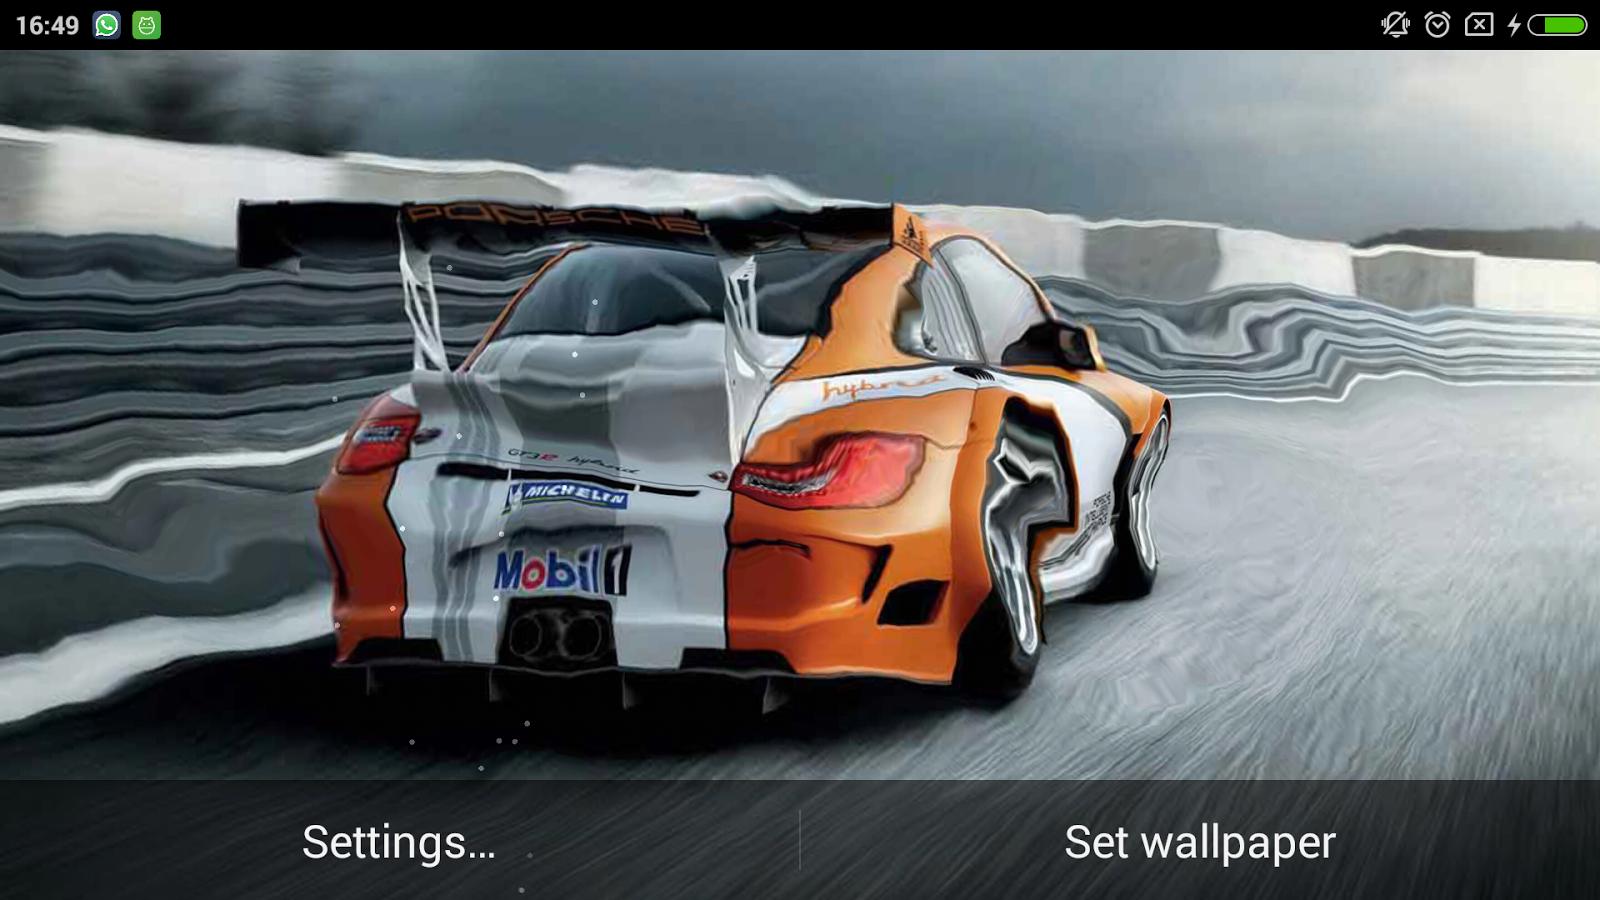 3d Car Ripple Live Wallpaper 1 1 Apk Download Android